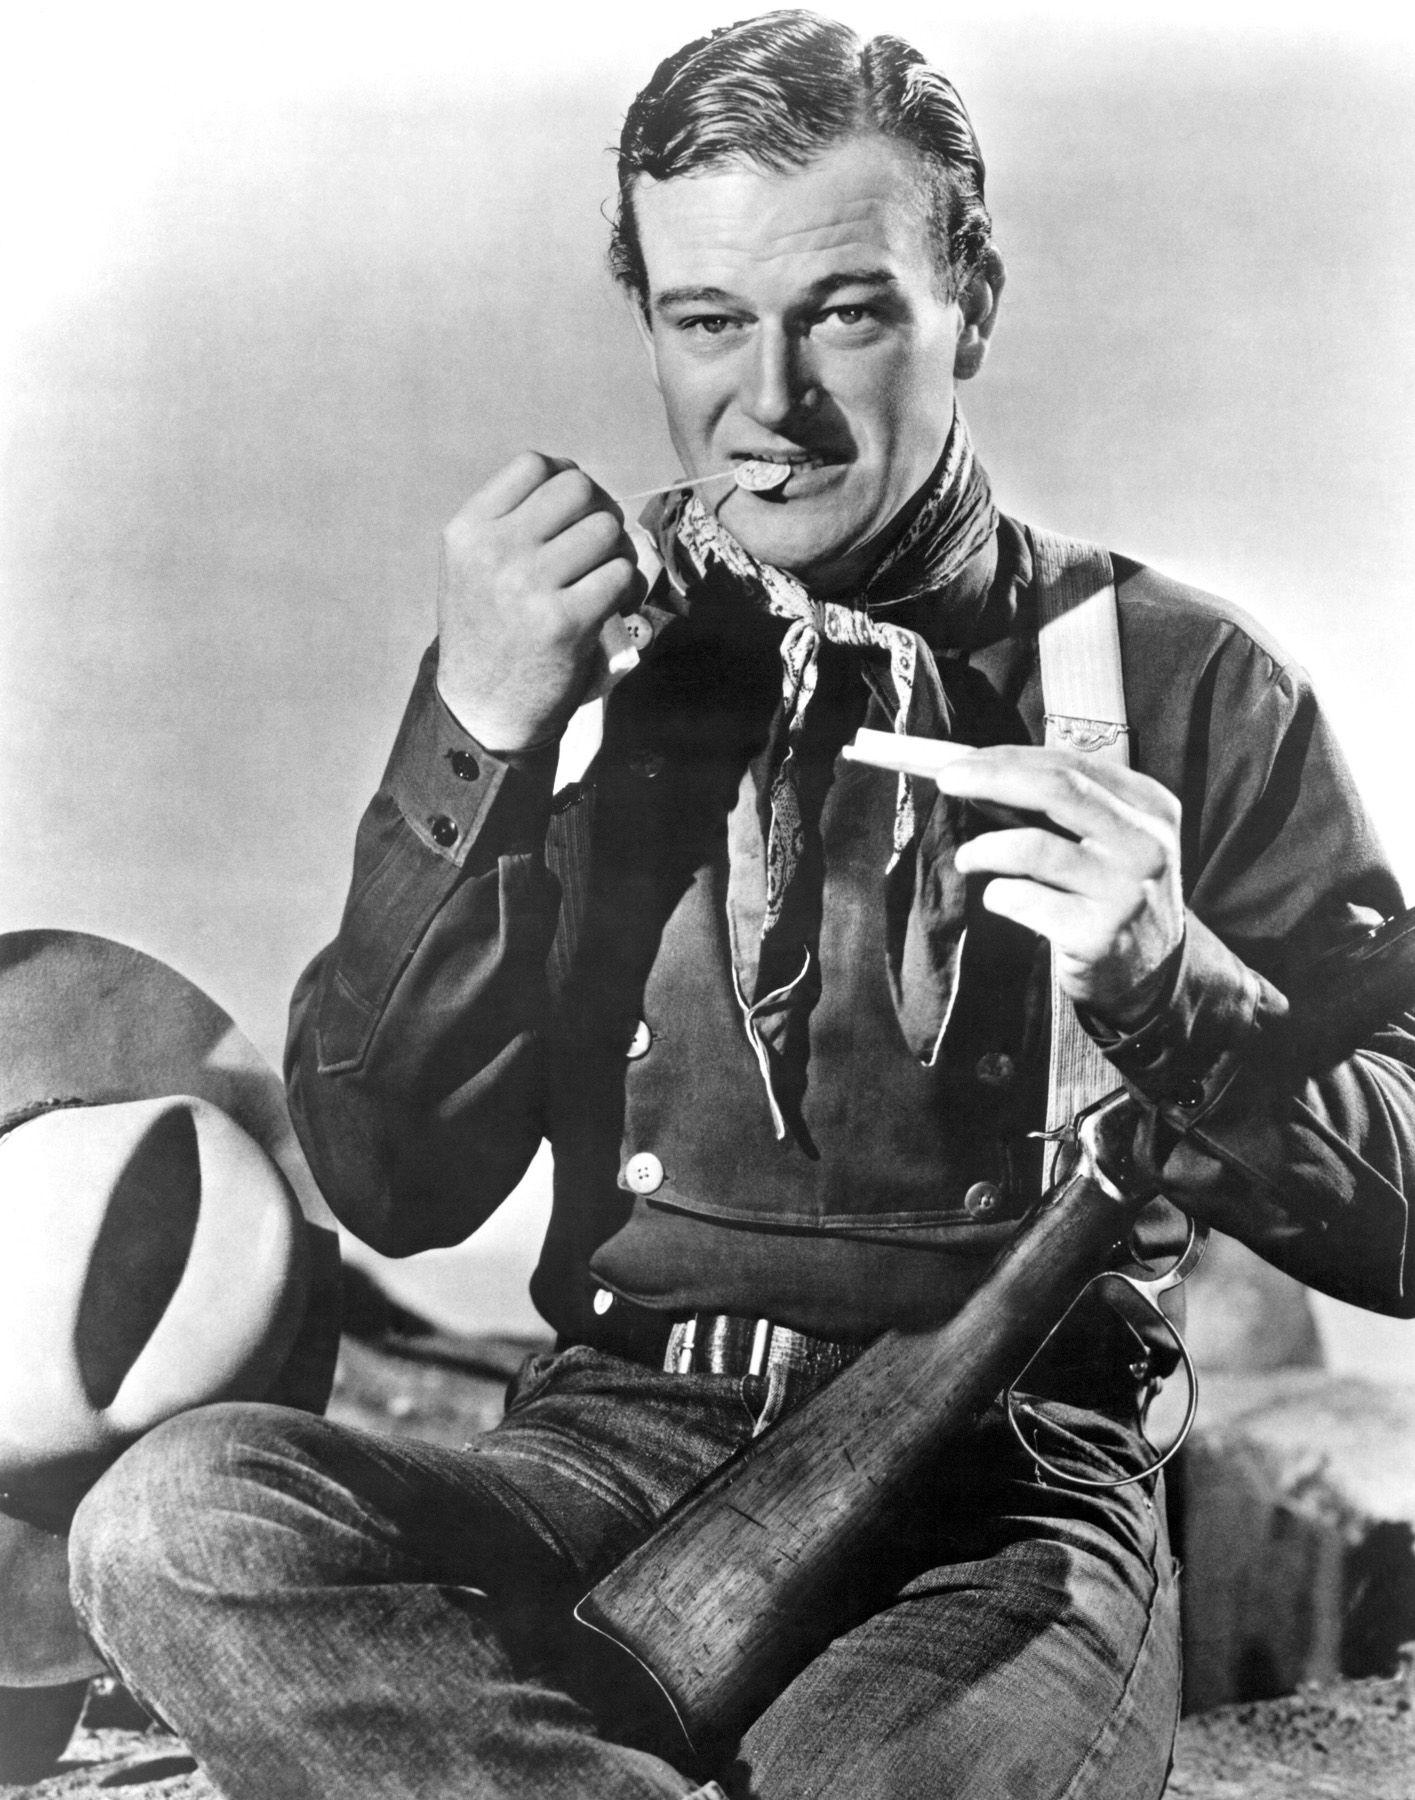 26 mai 1907 : naissance de John Wayne.